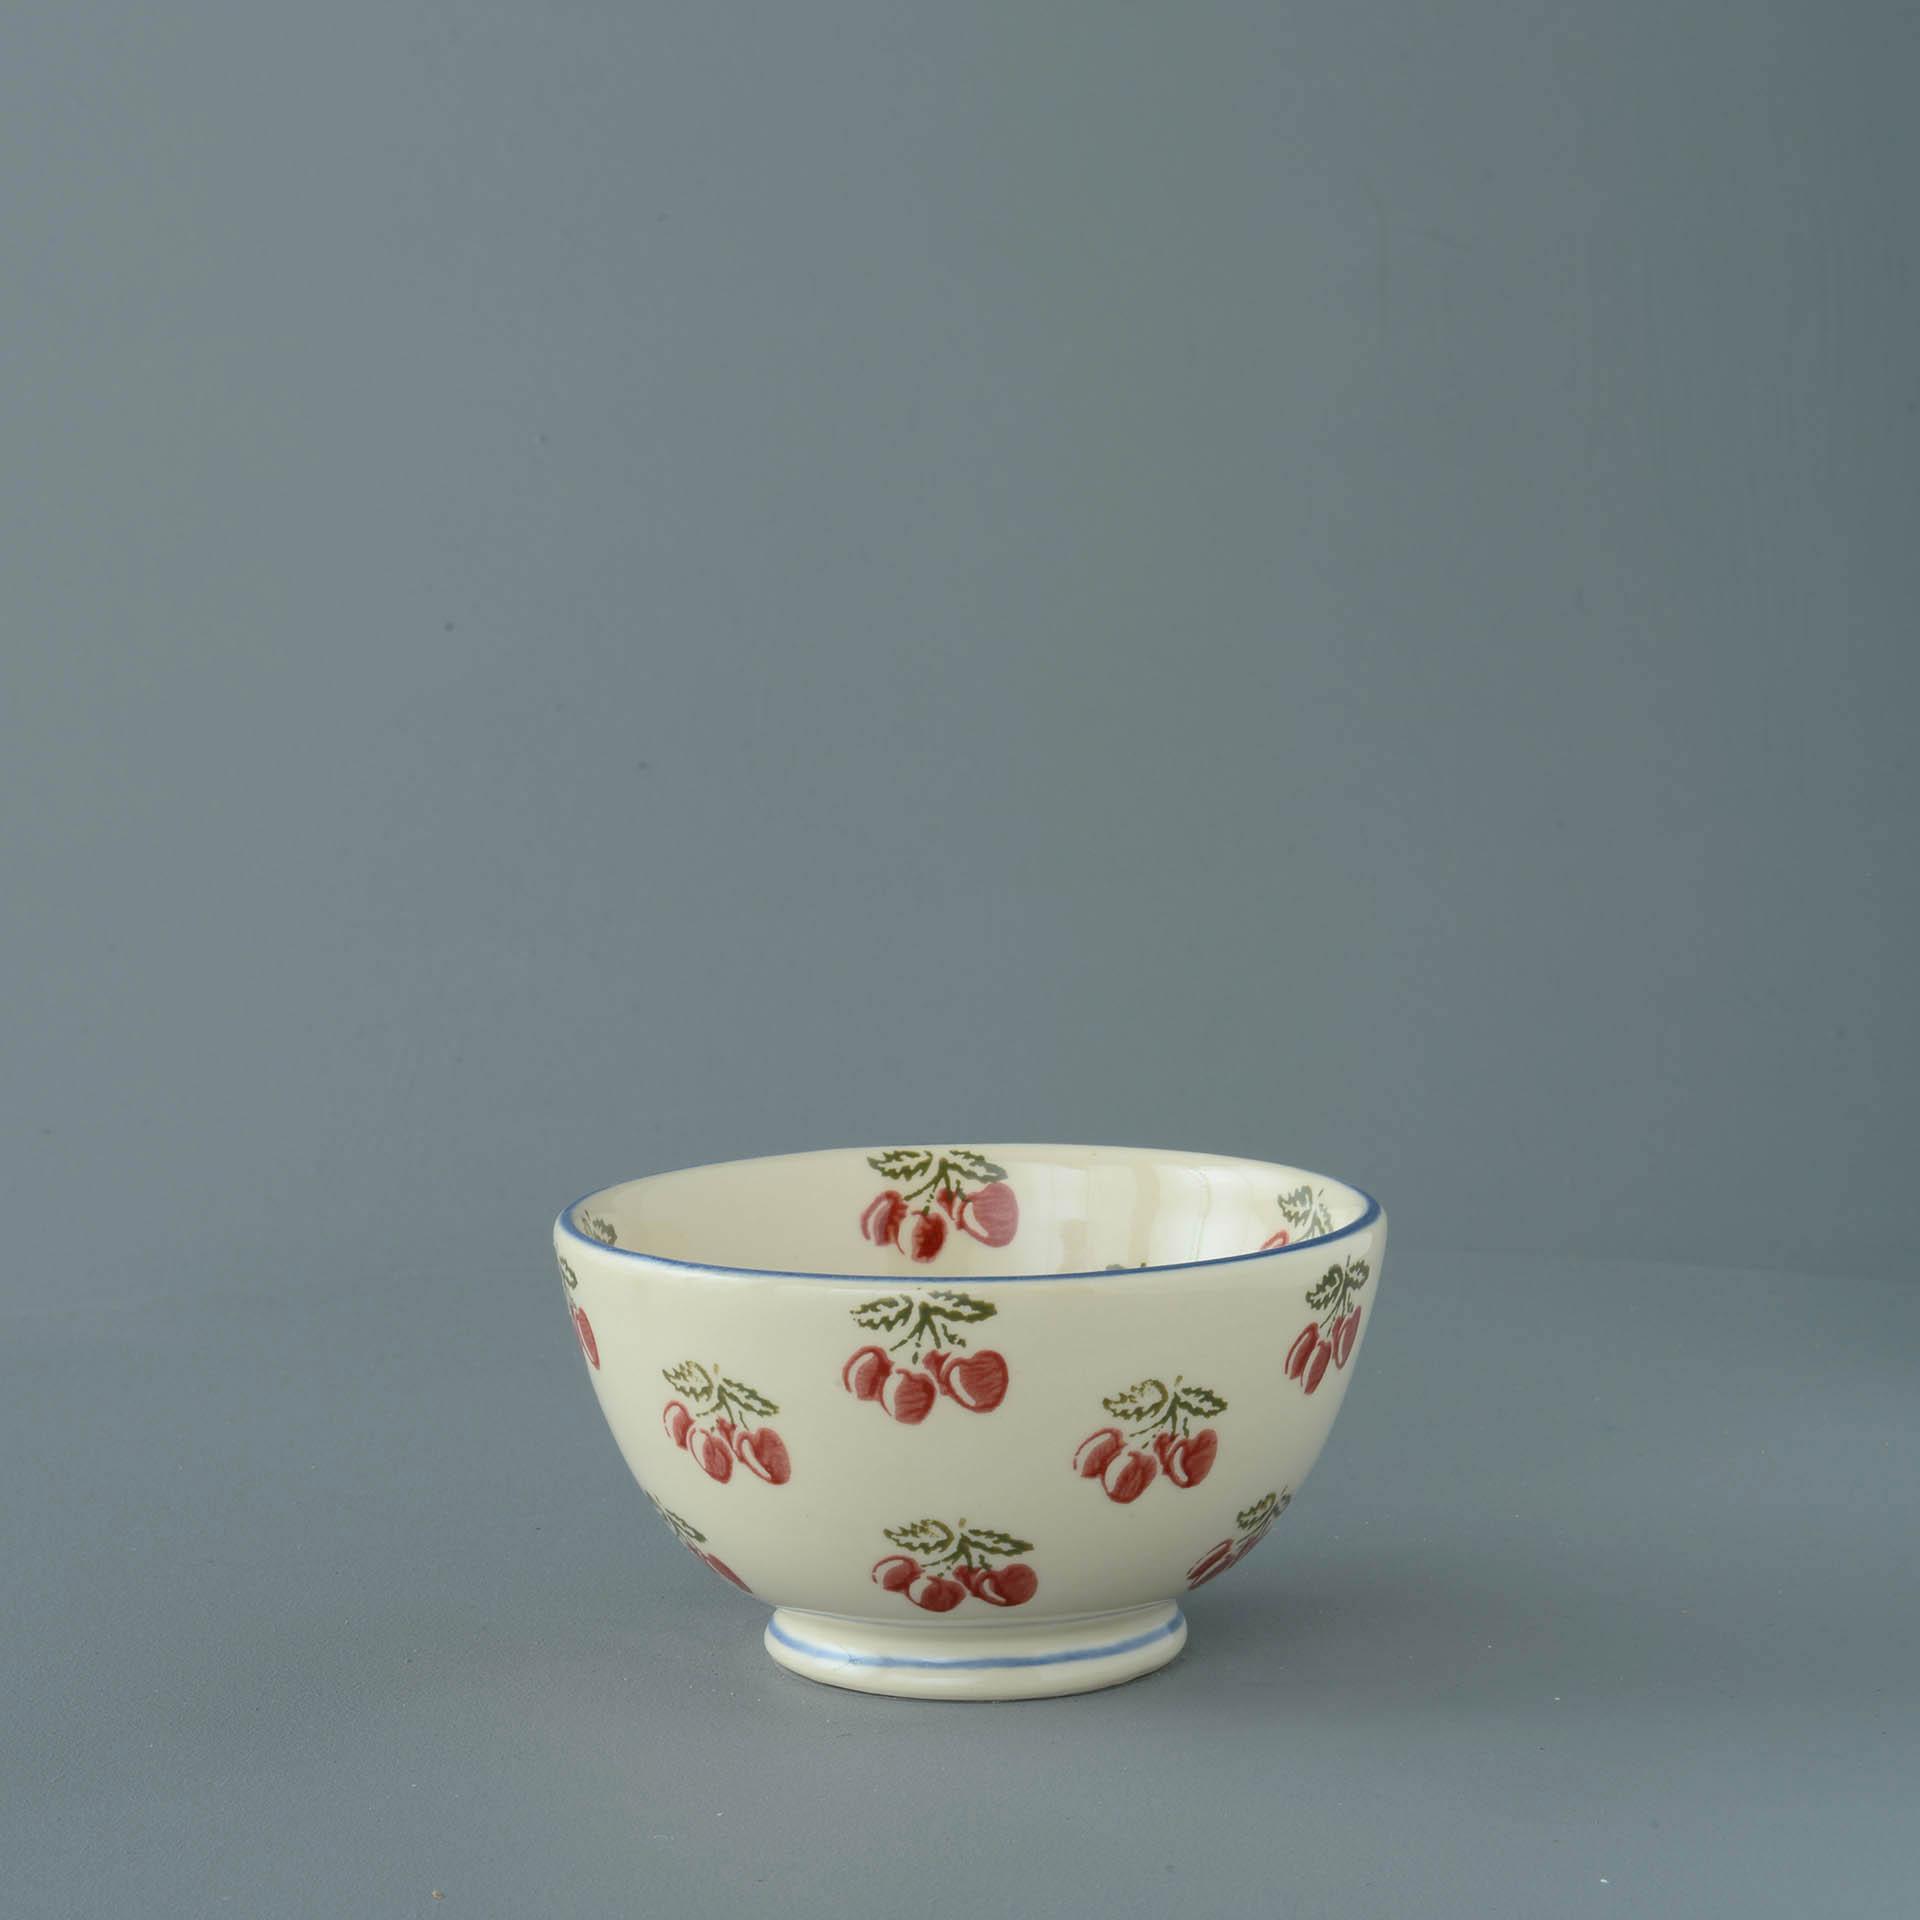 Cherries Cereal Bowl 7 x 13cm